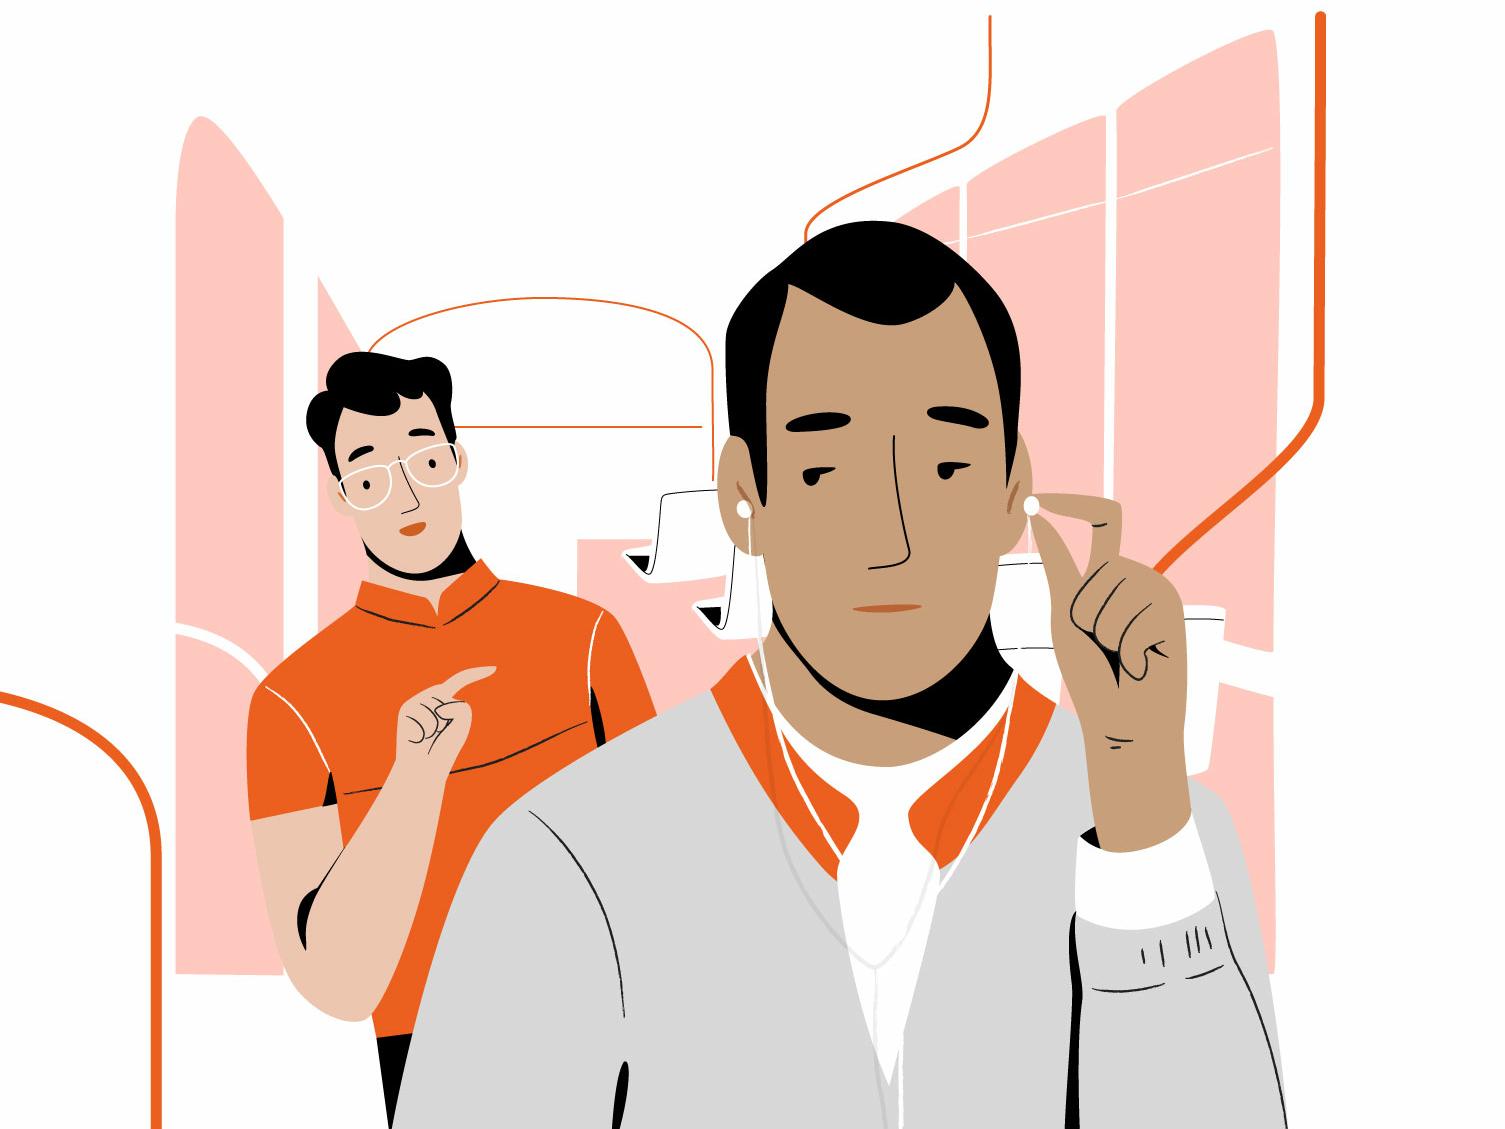 Uhm bus men design people app vector character illustration